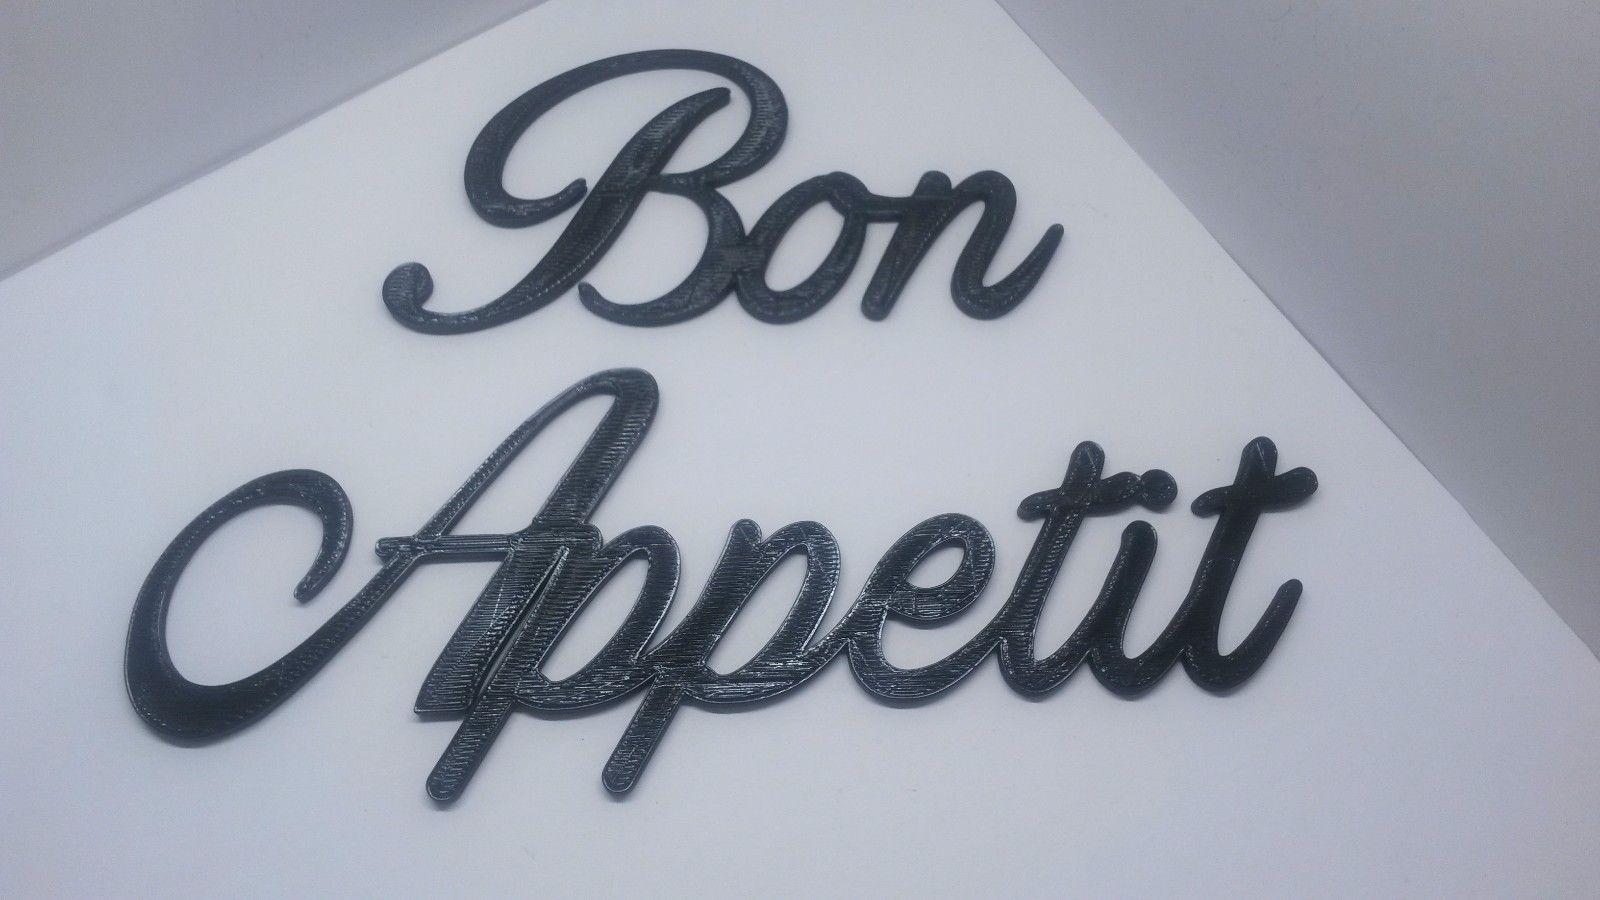 Bon appetit word art sign home kitchen wall hanging cursive script